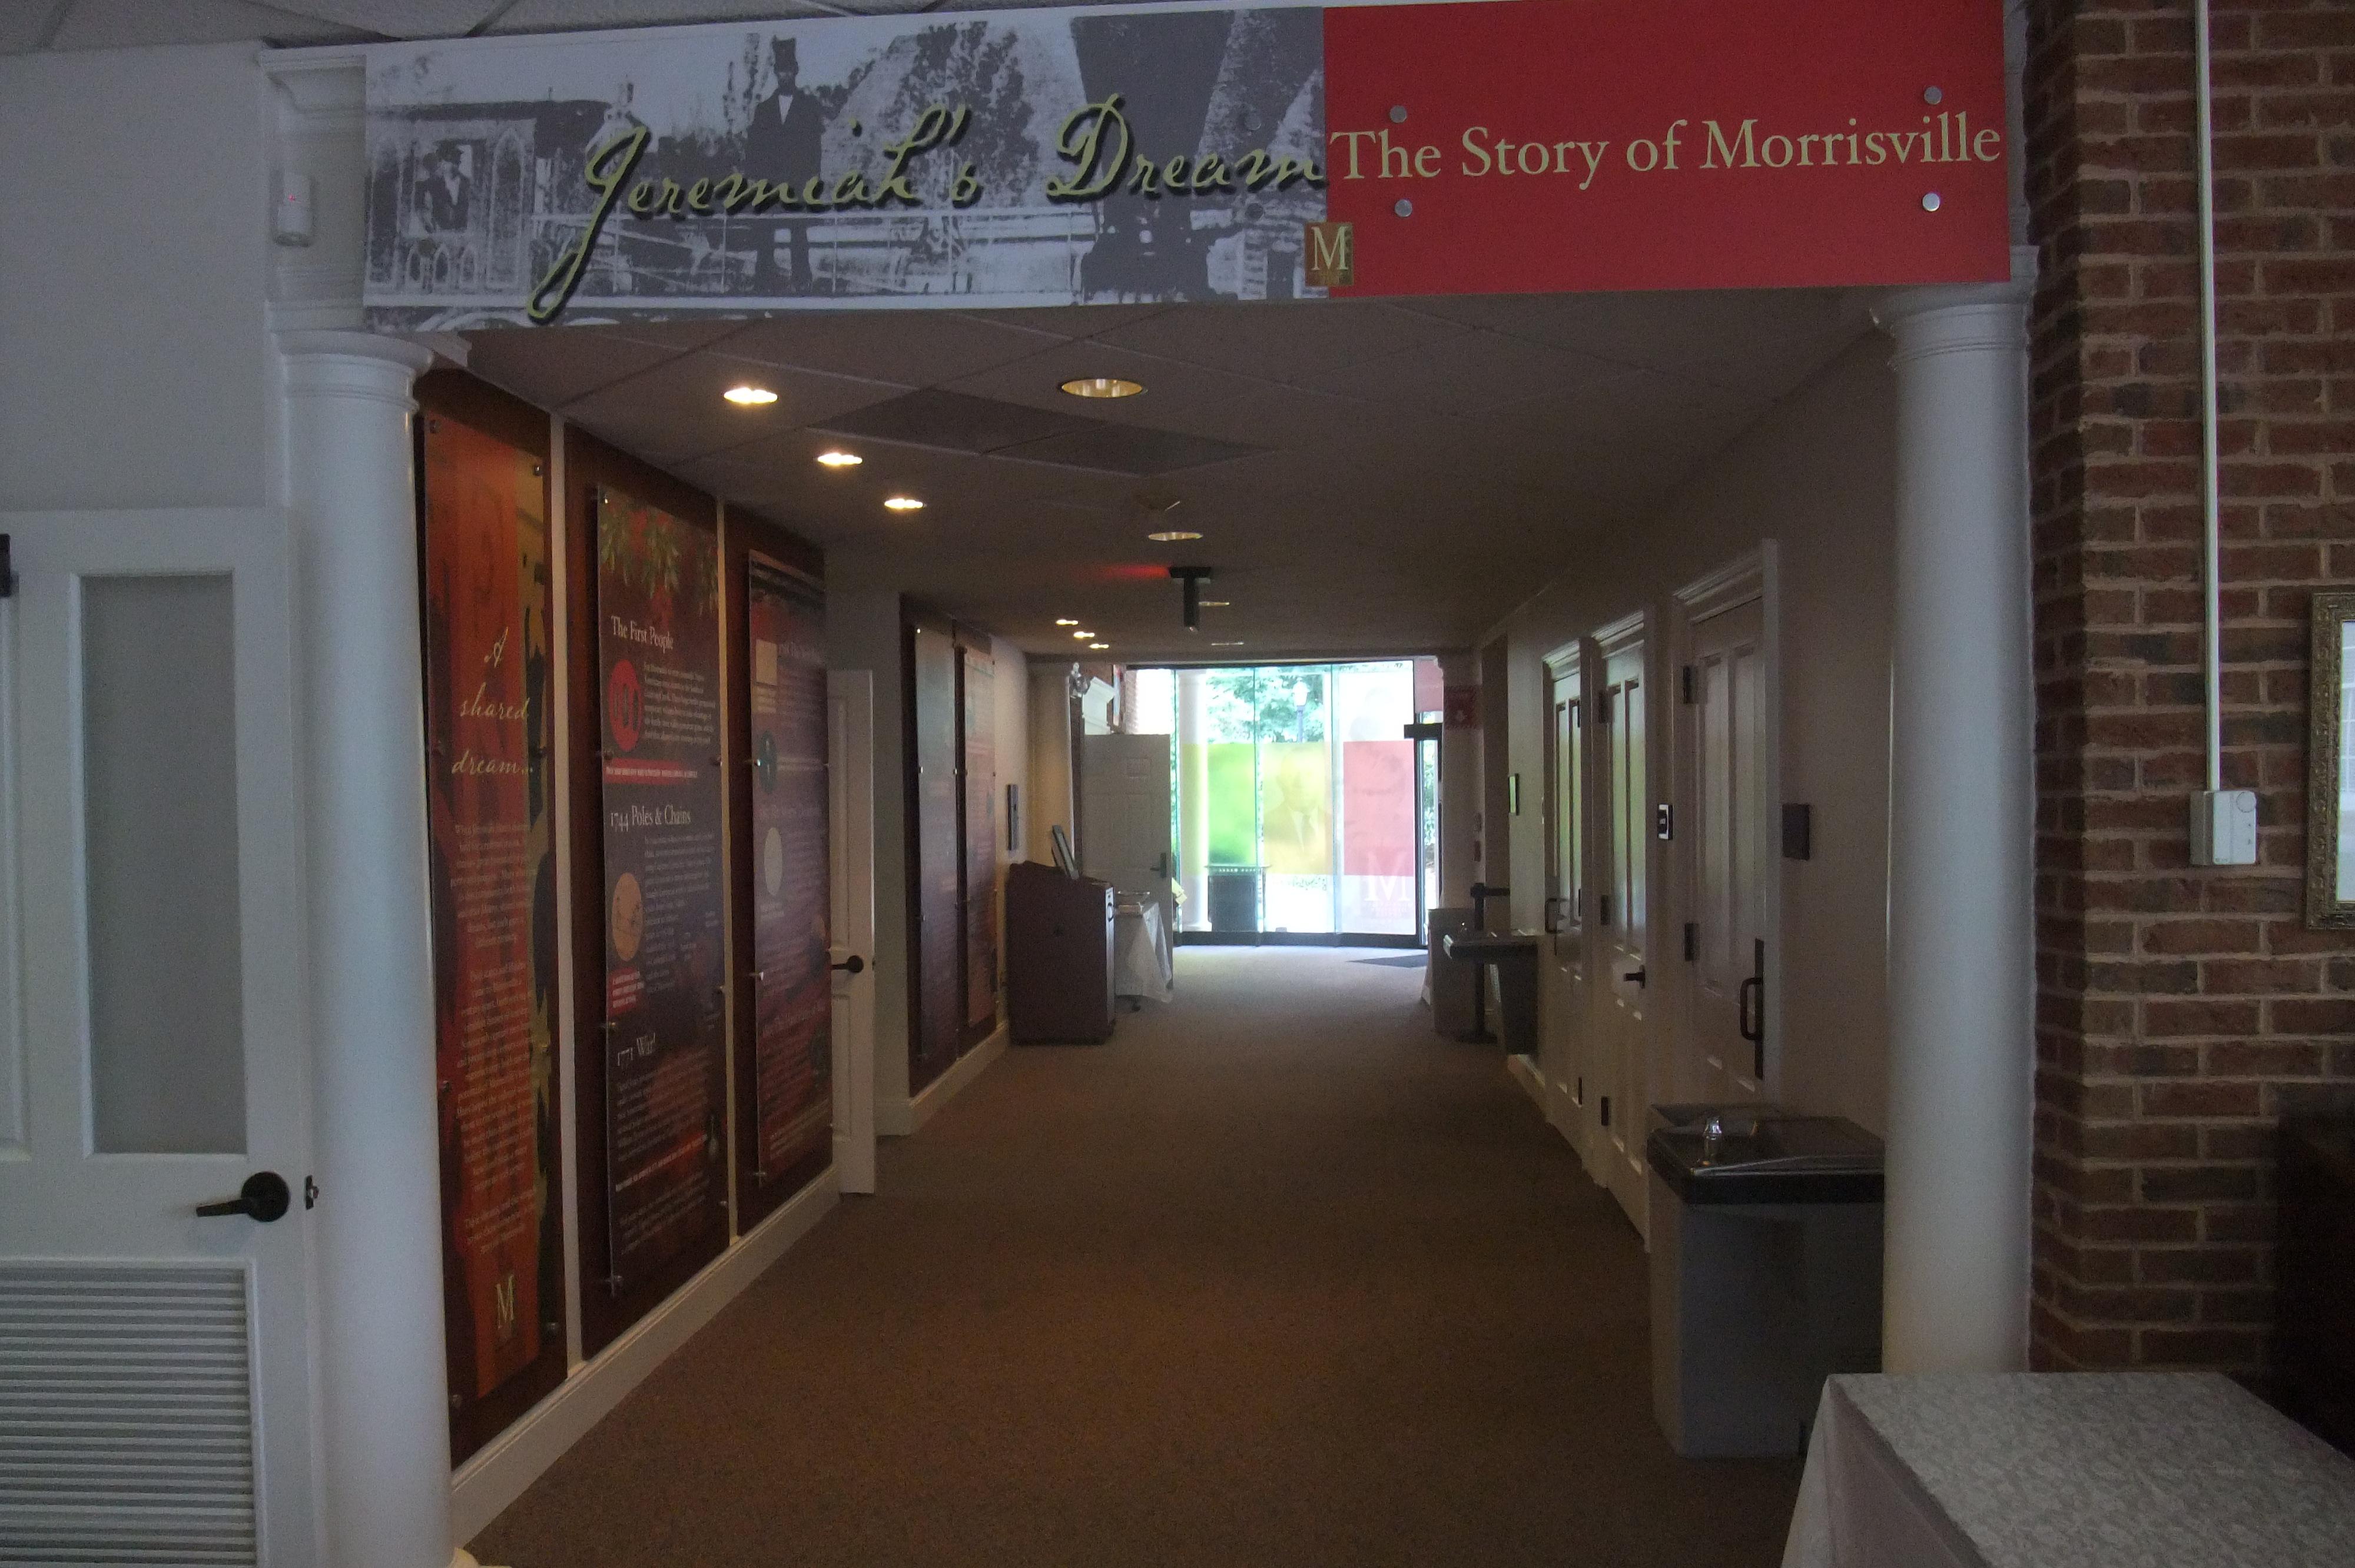 Entrance to Jeremiah's Dream exhibit.